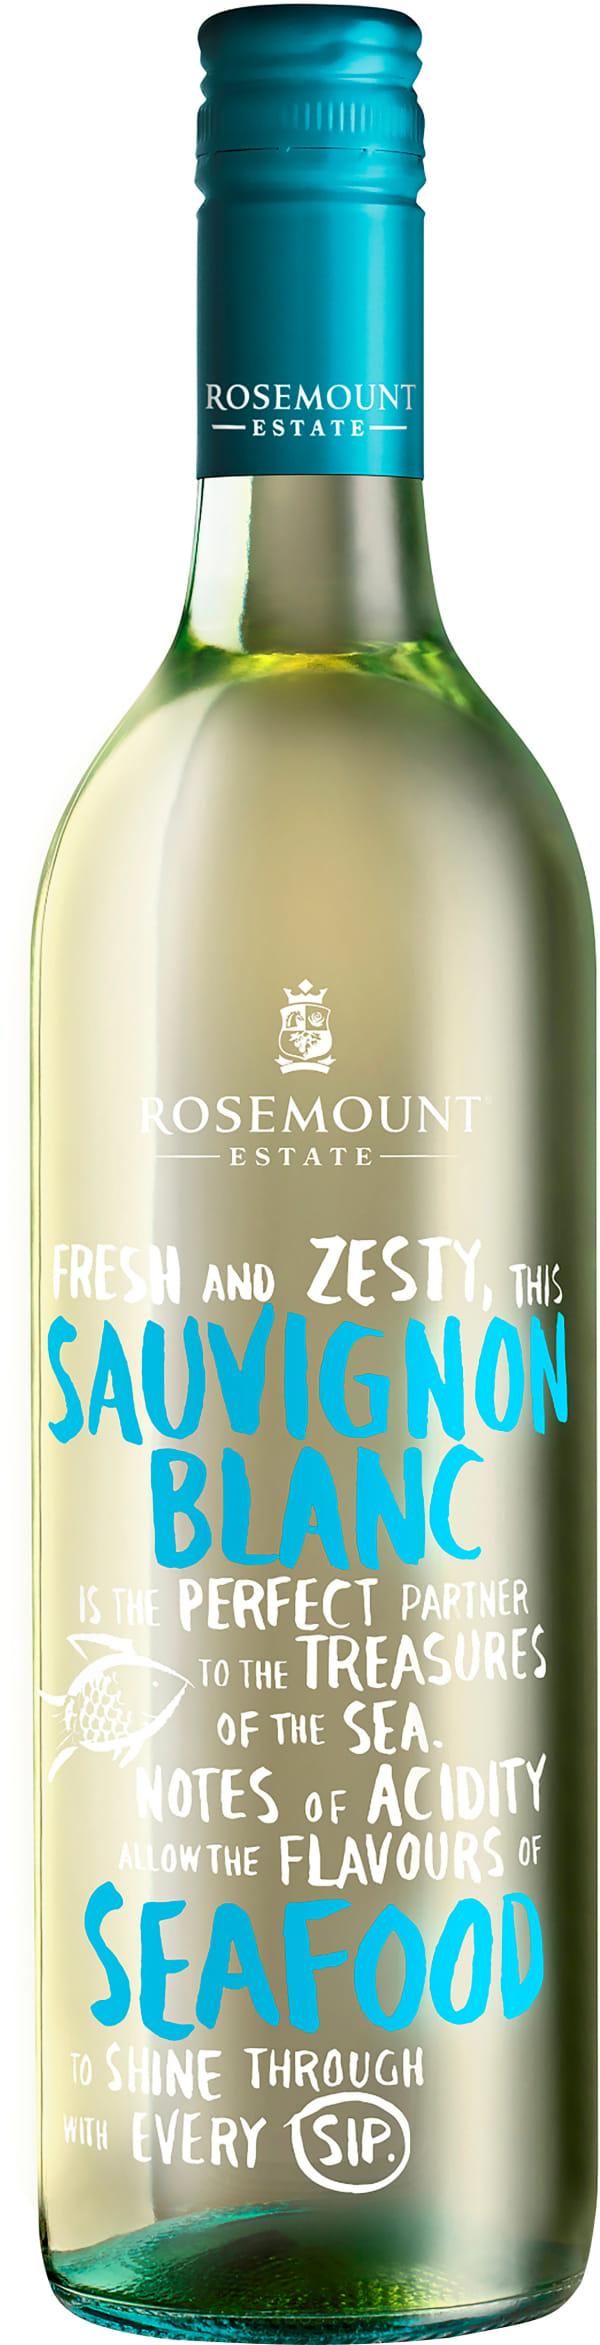 Rosemount Seafood Sauvignon Blanc 2016